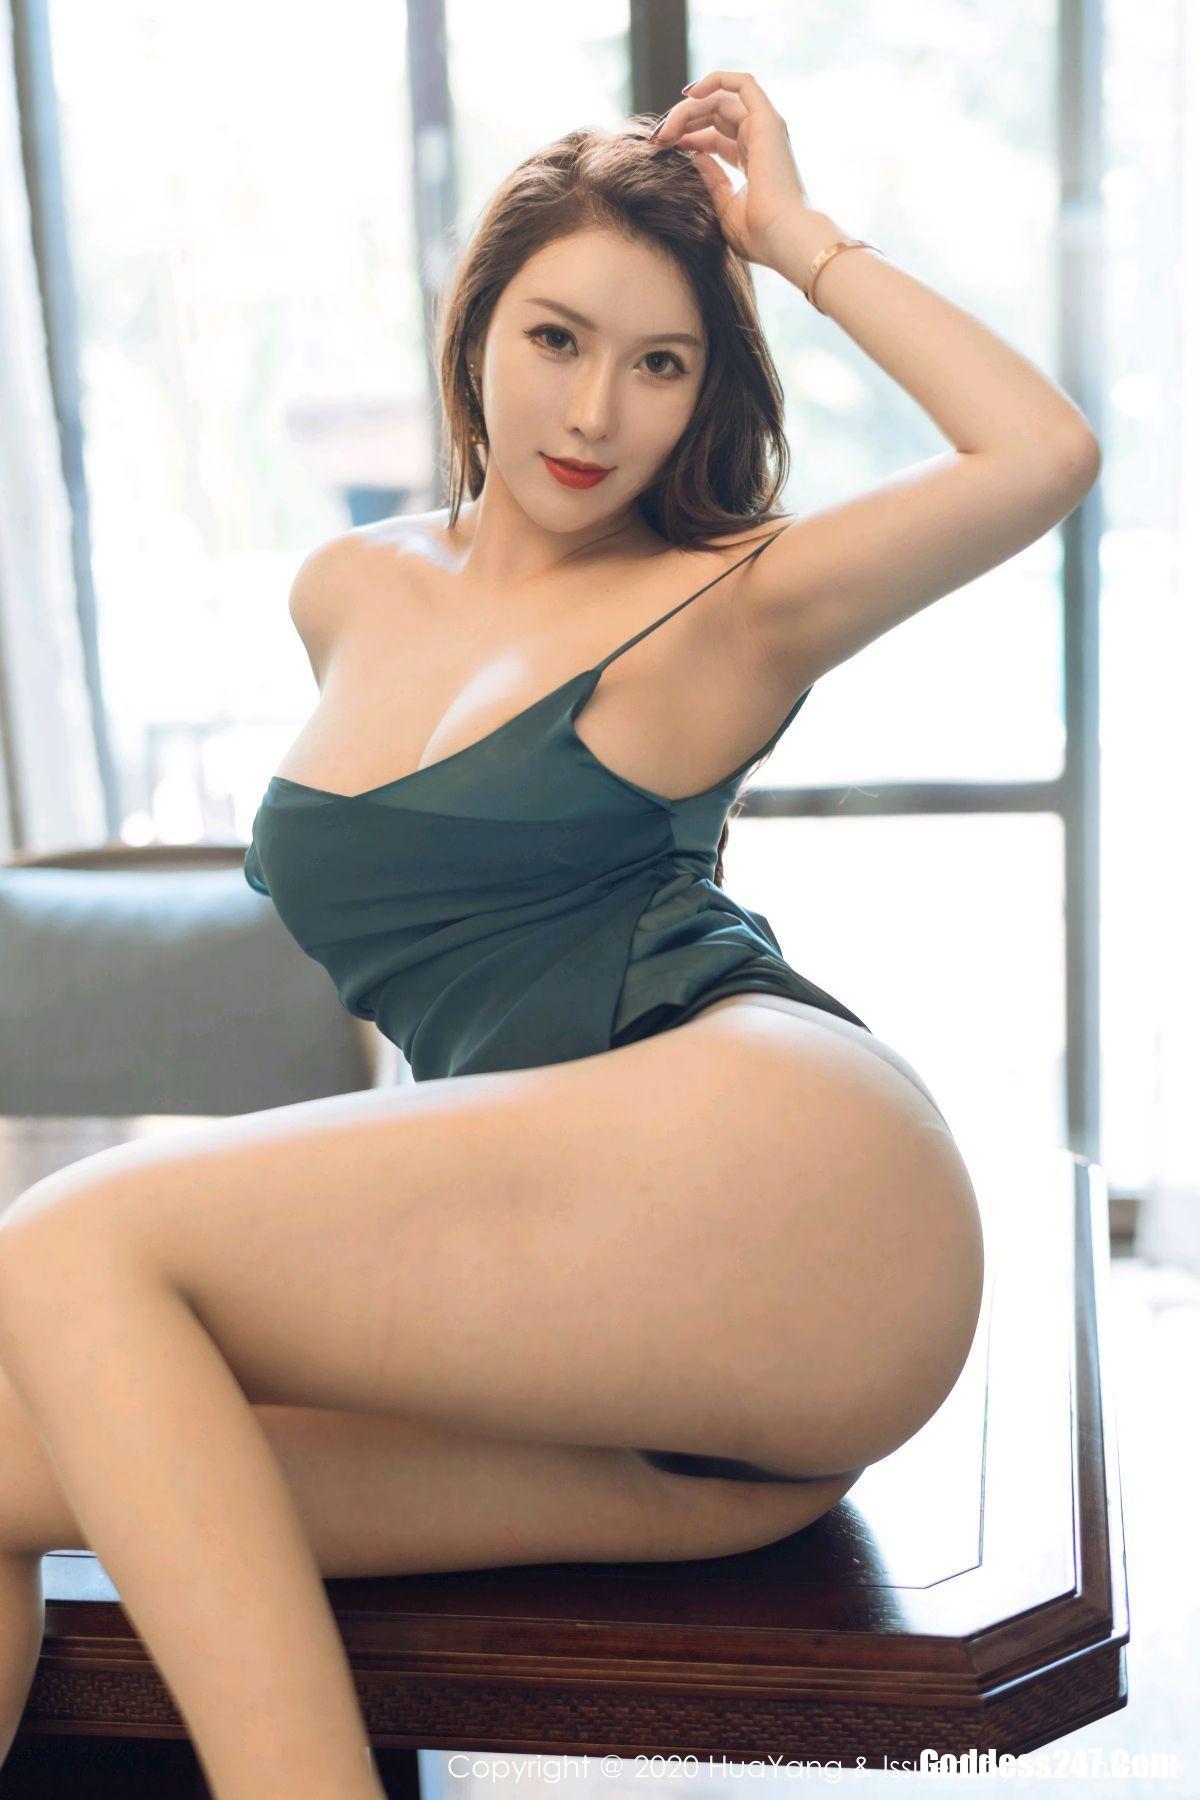 HuaYang花漾Show Vol.294 Egg-尤妮丝Egg, HuaYang花漾Show Vol.294, Egg-尤妮丝Egg